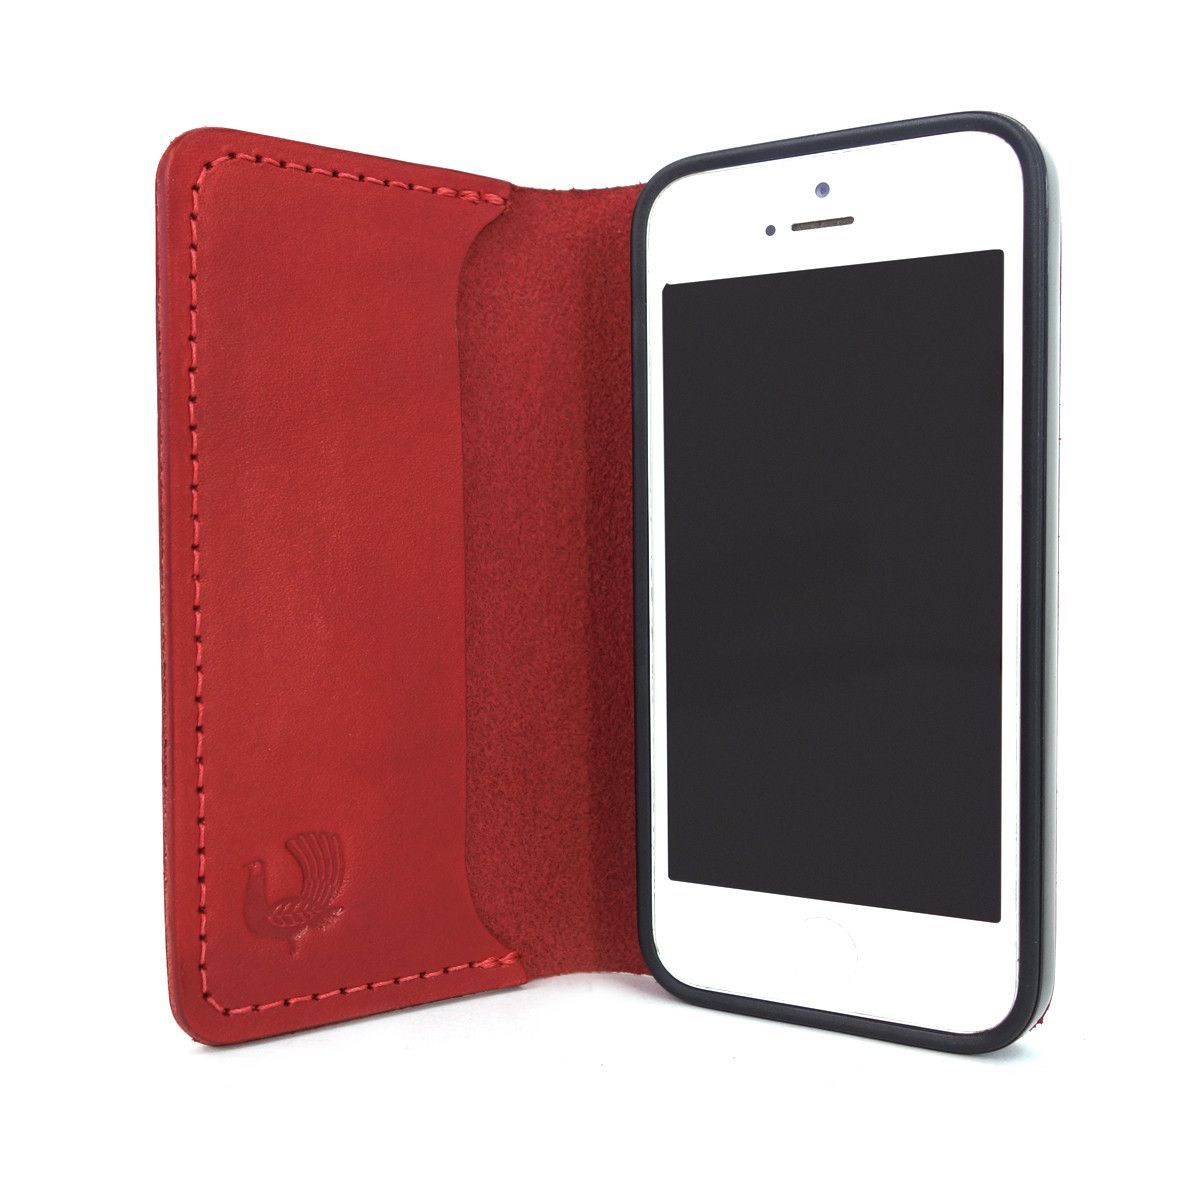 theSLIMbook™ 5 - True Red